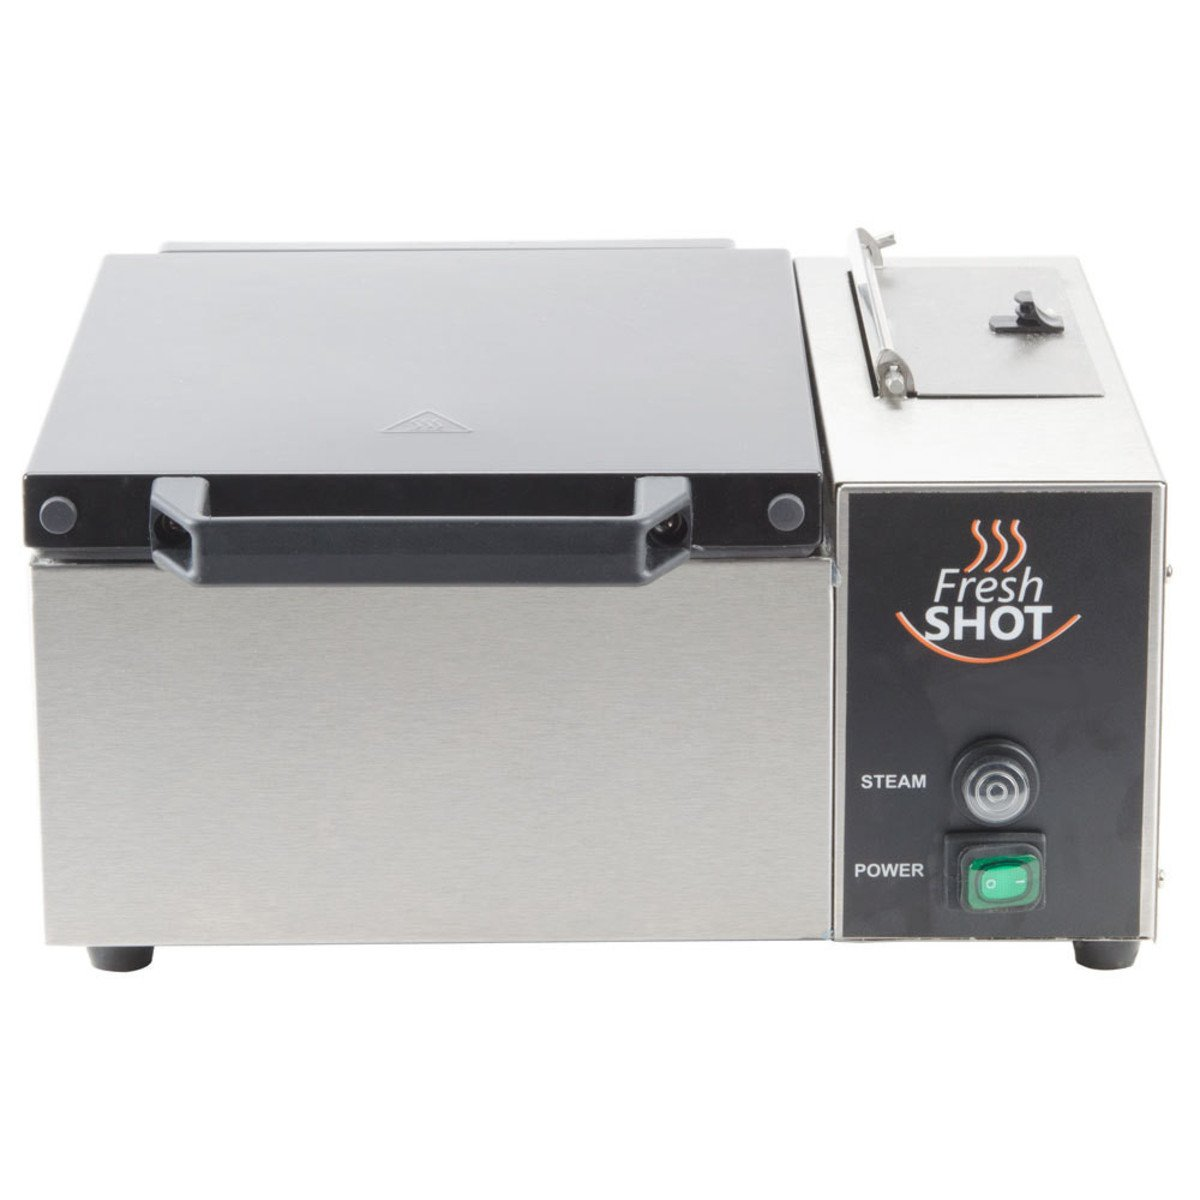 Empura CTS-1800W Fresh Shot Countertop Steamer